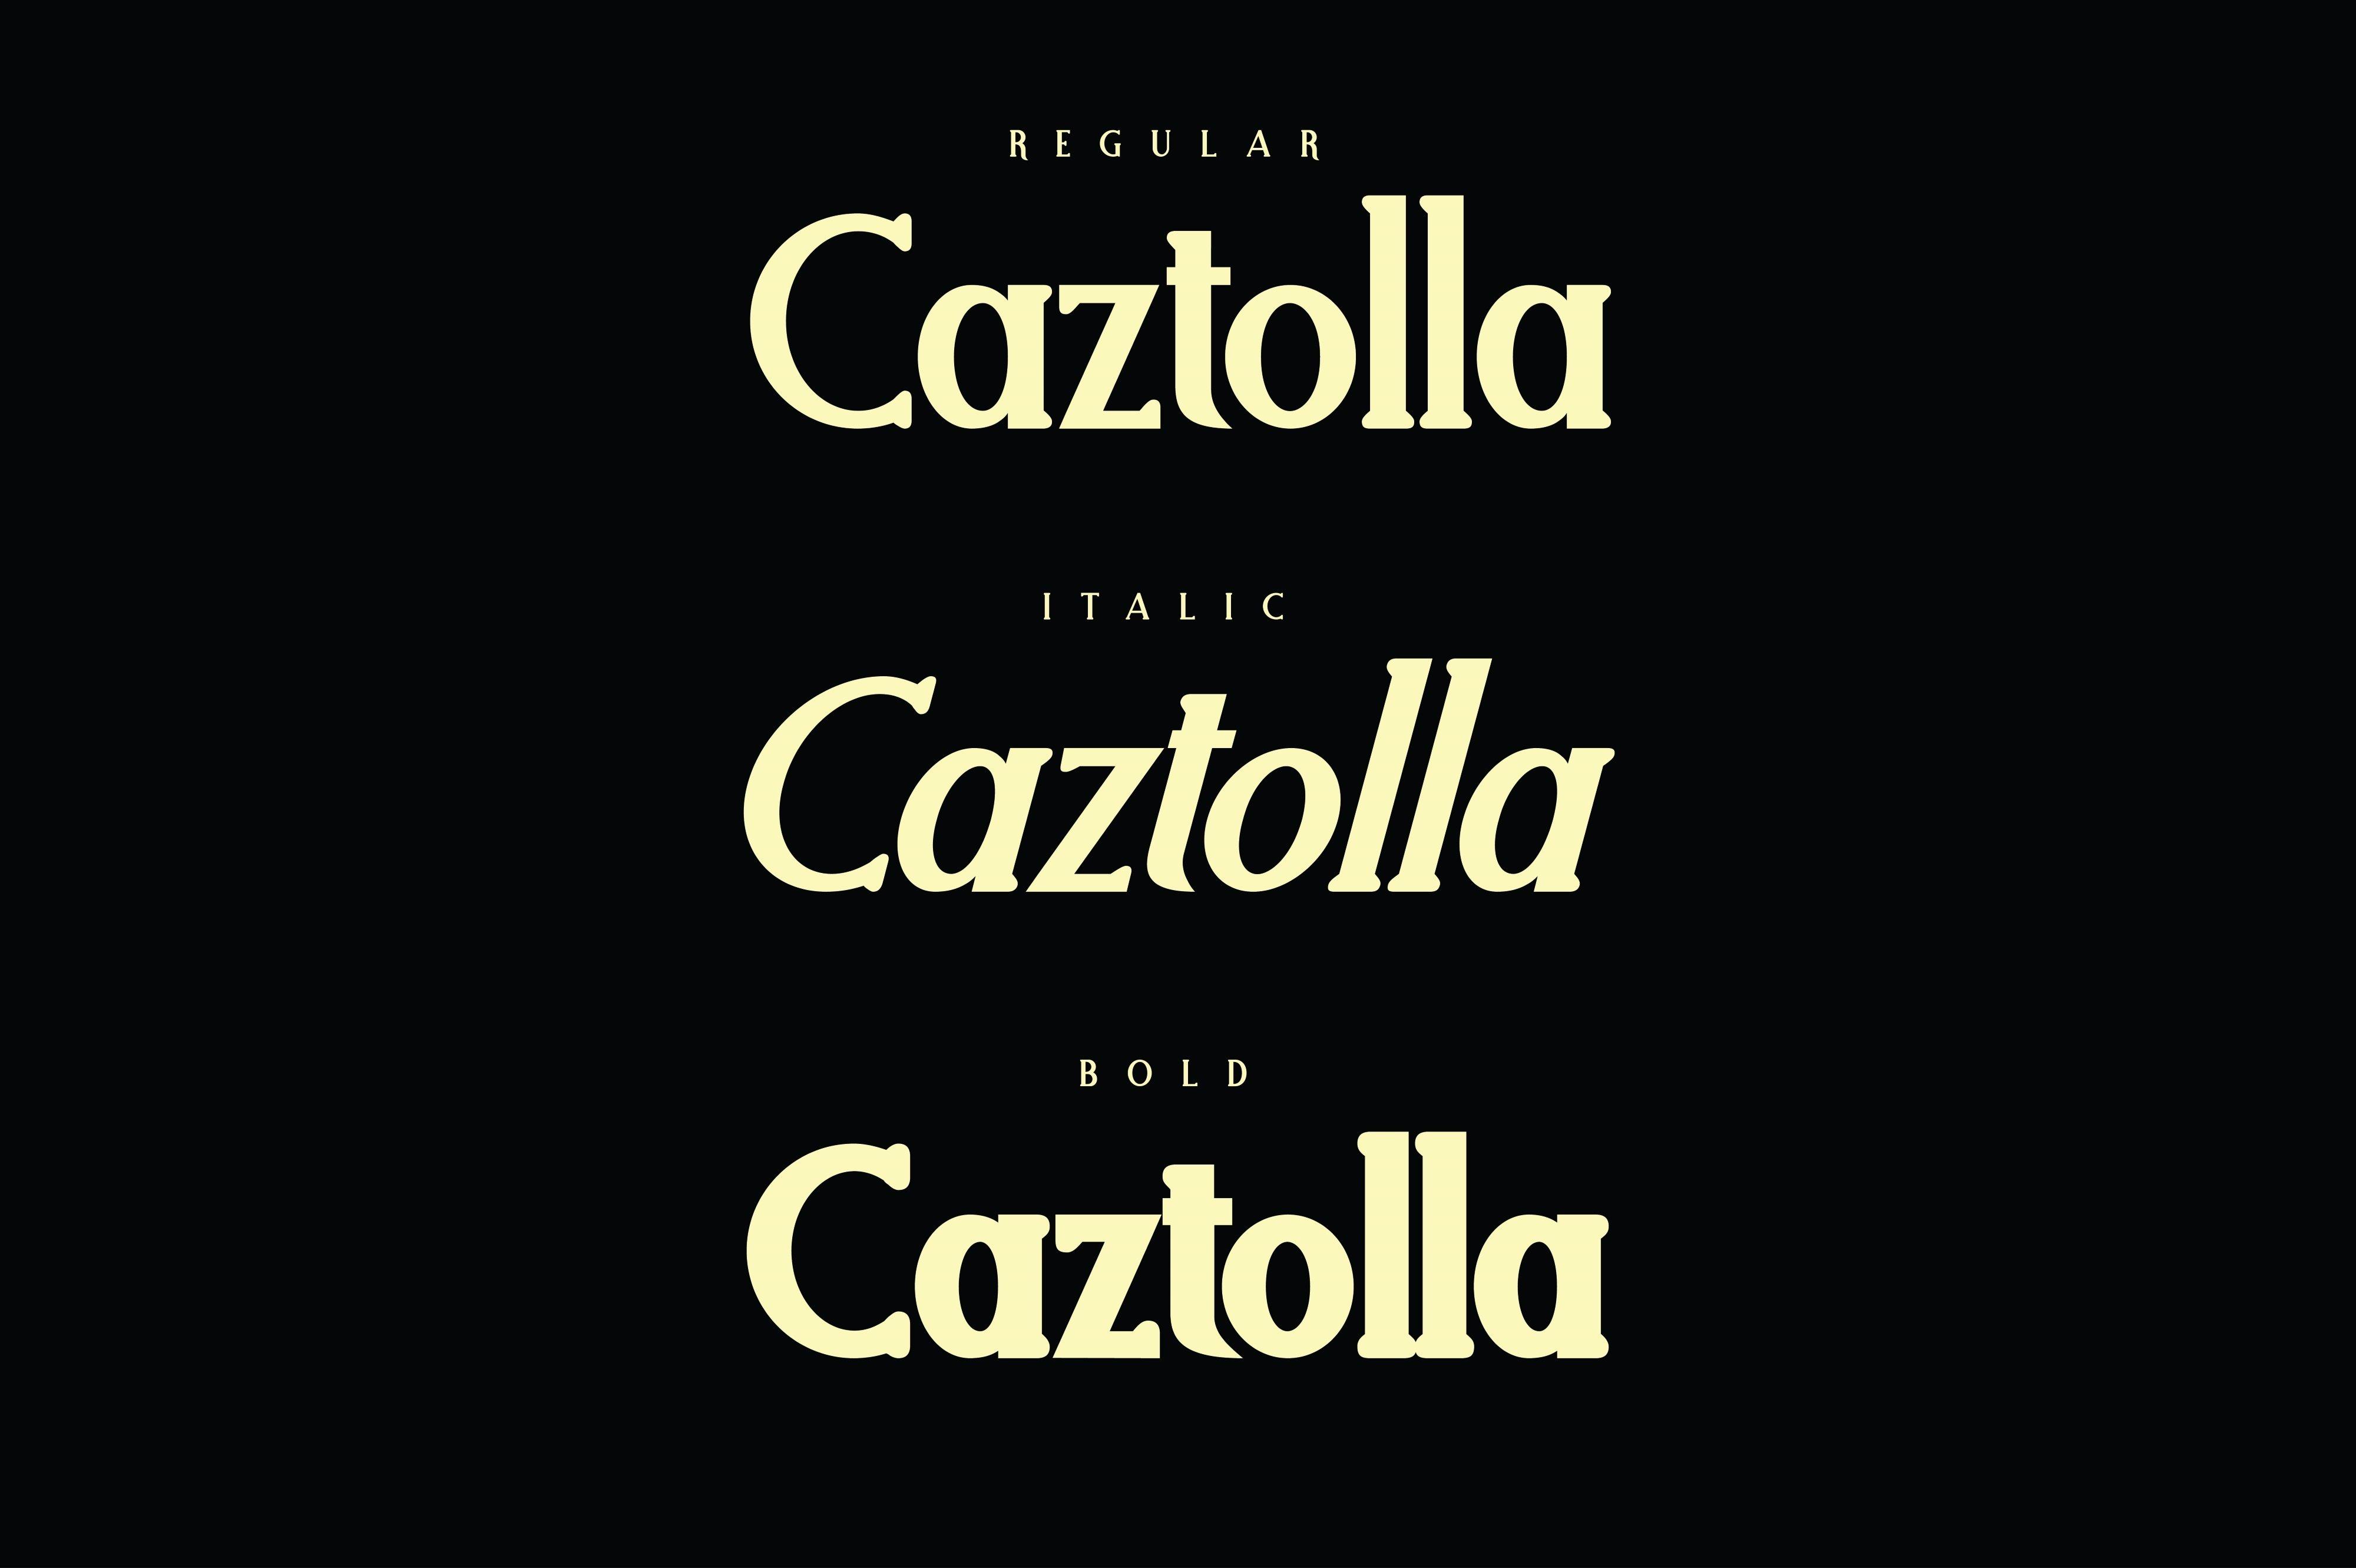 Caztolla example image 2